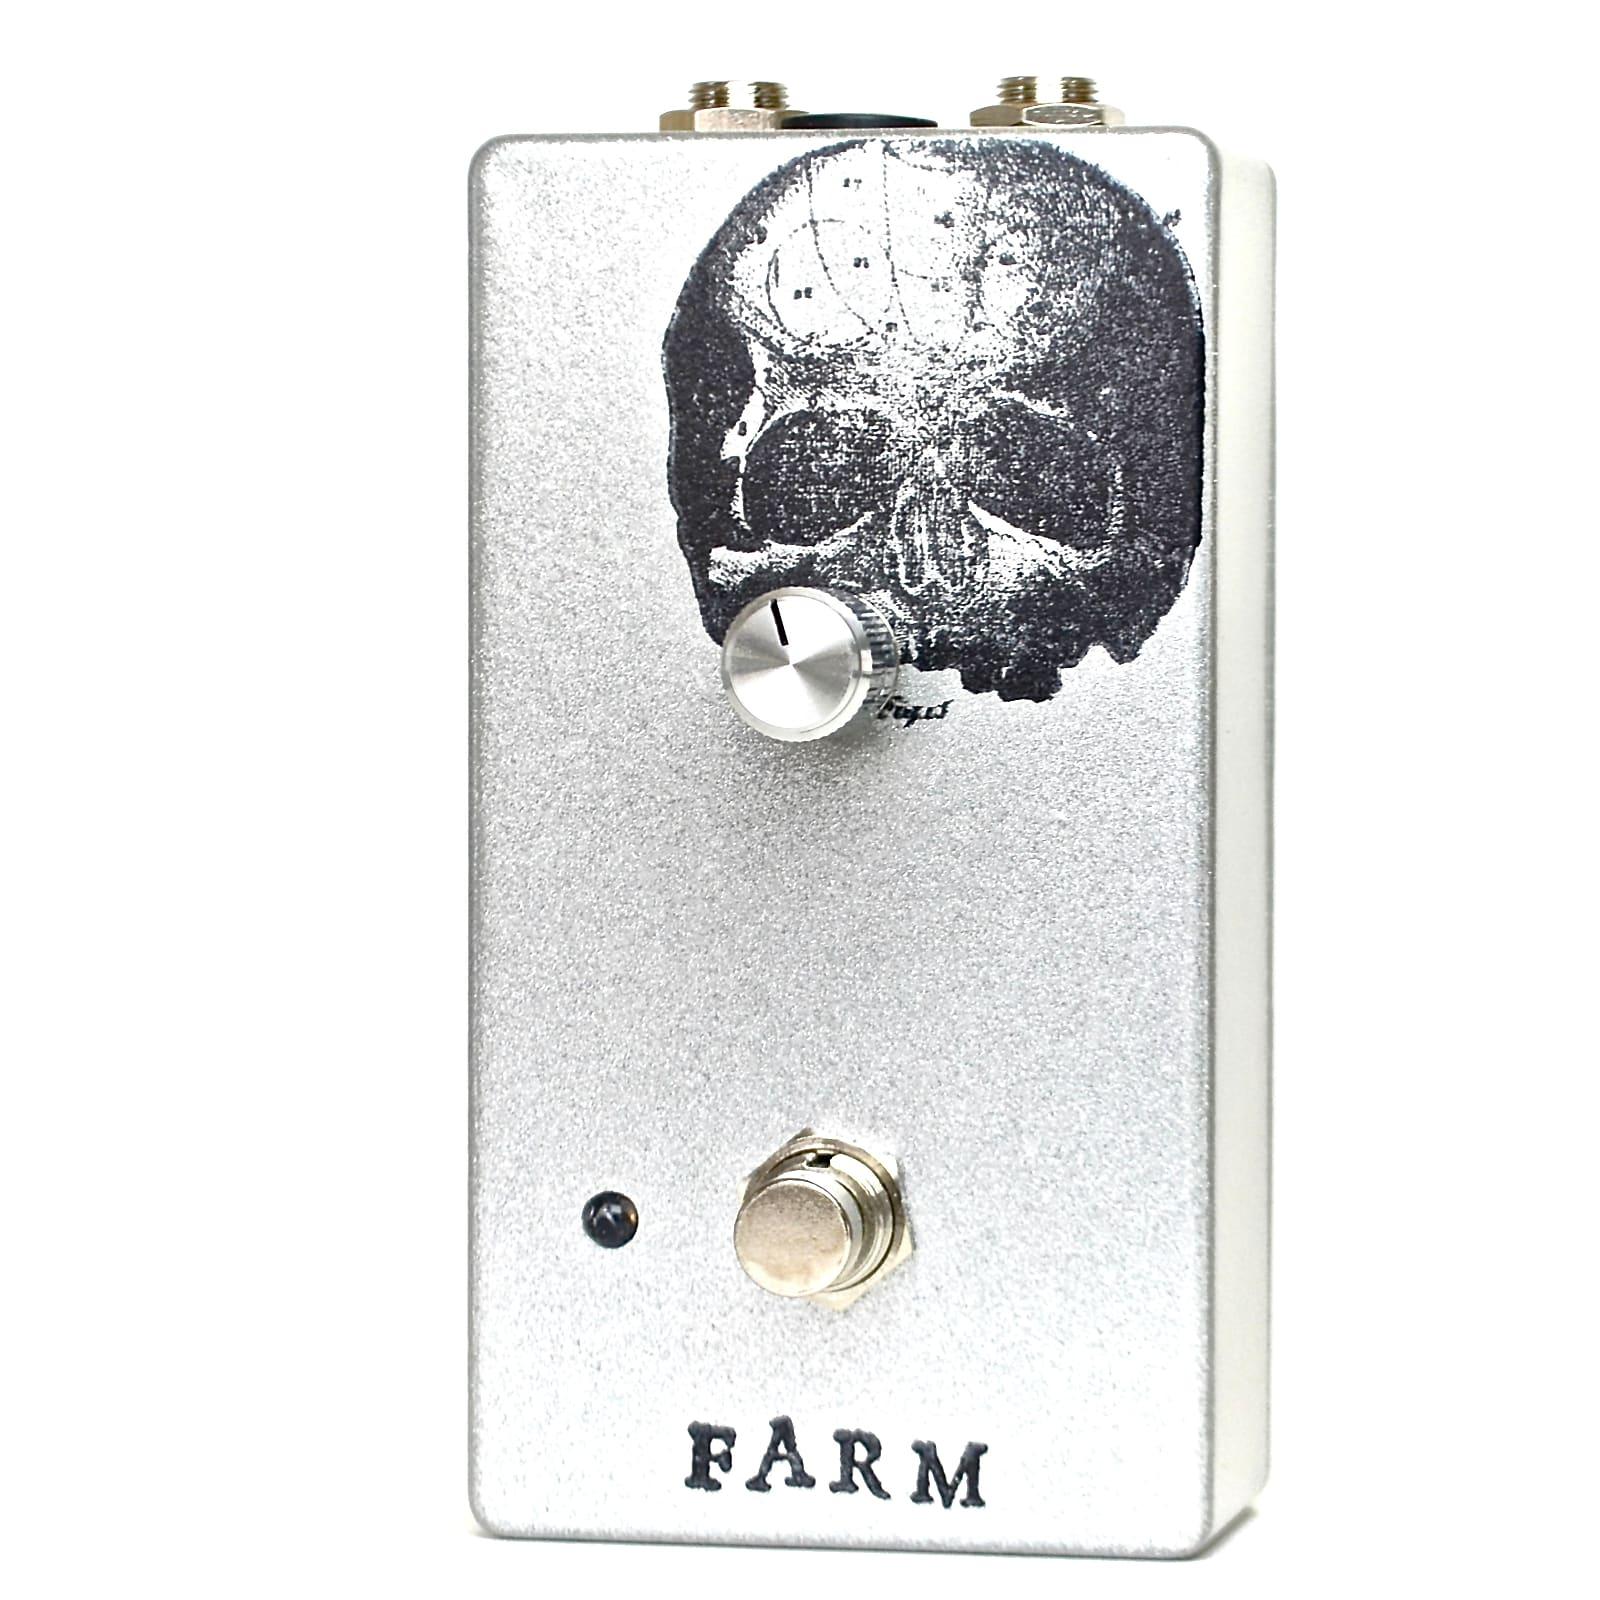 Farm The Screams, analog octave up